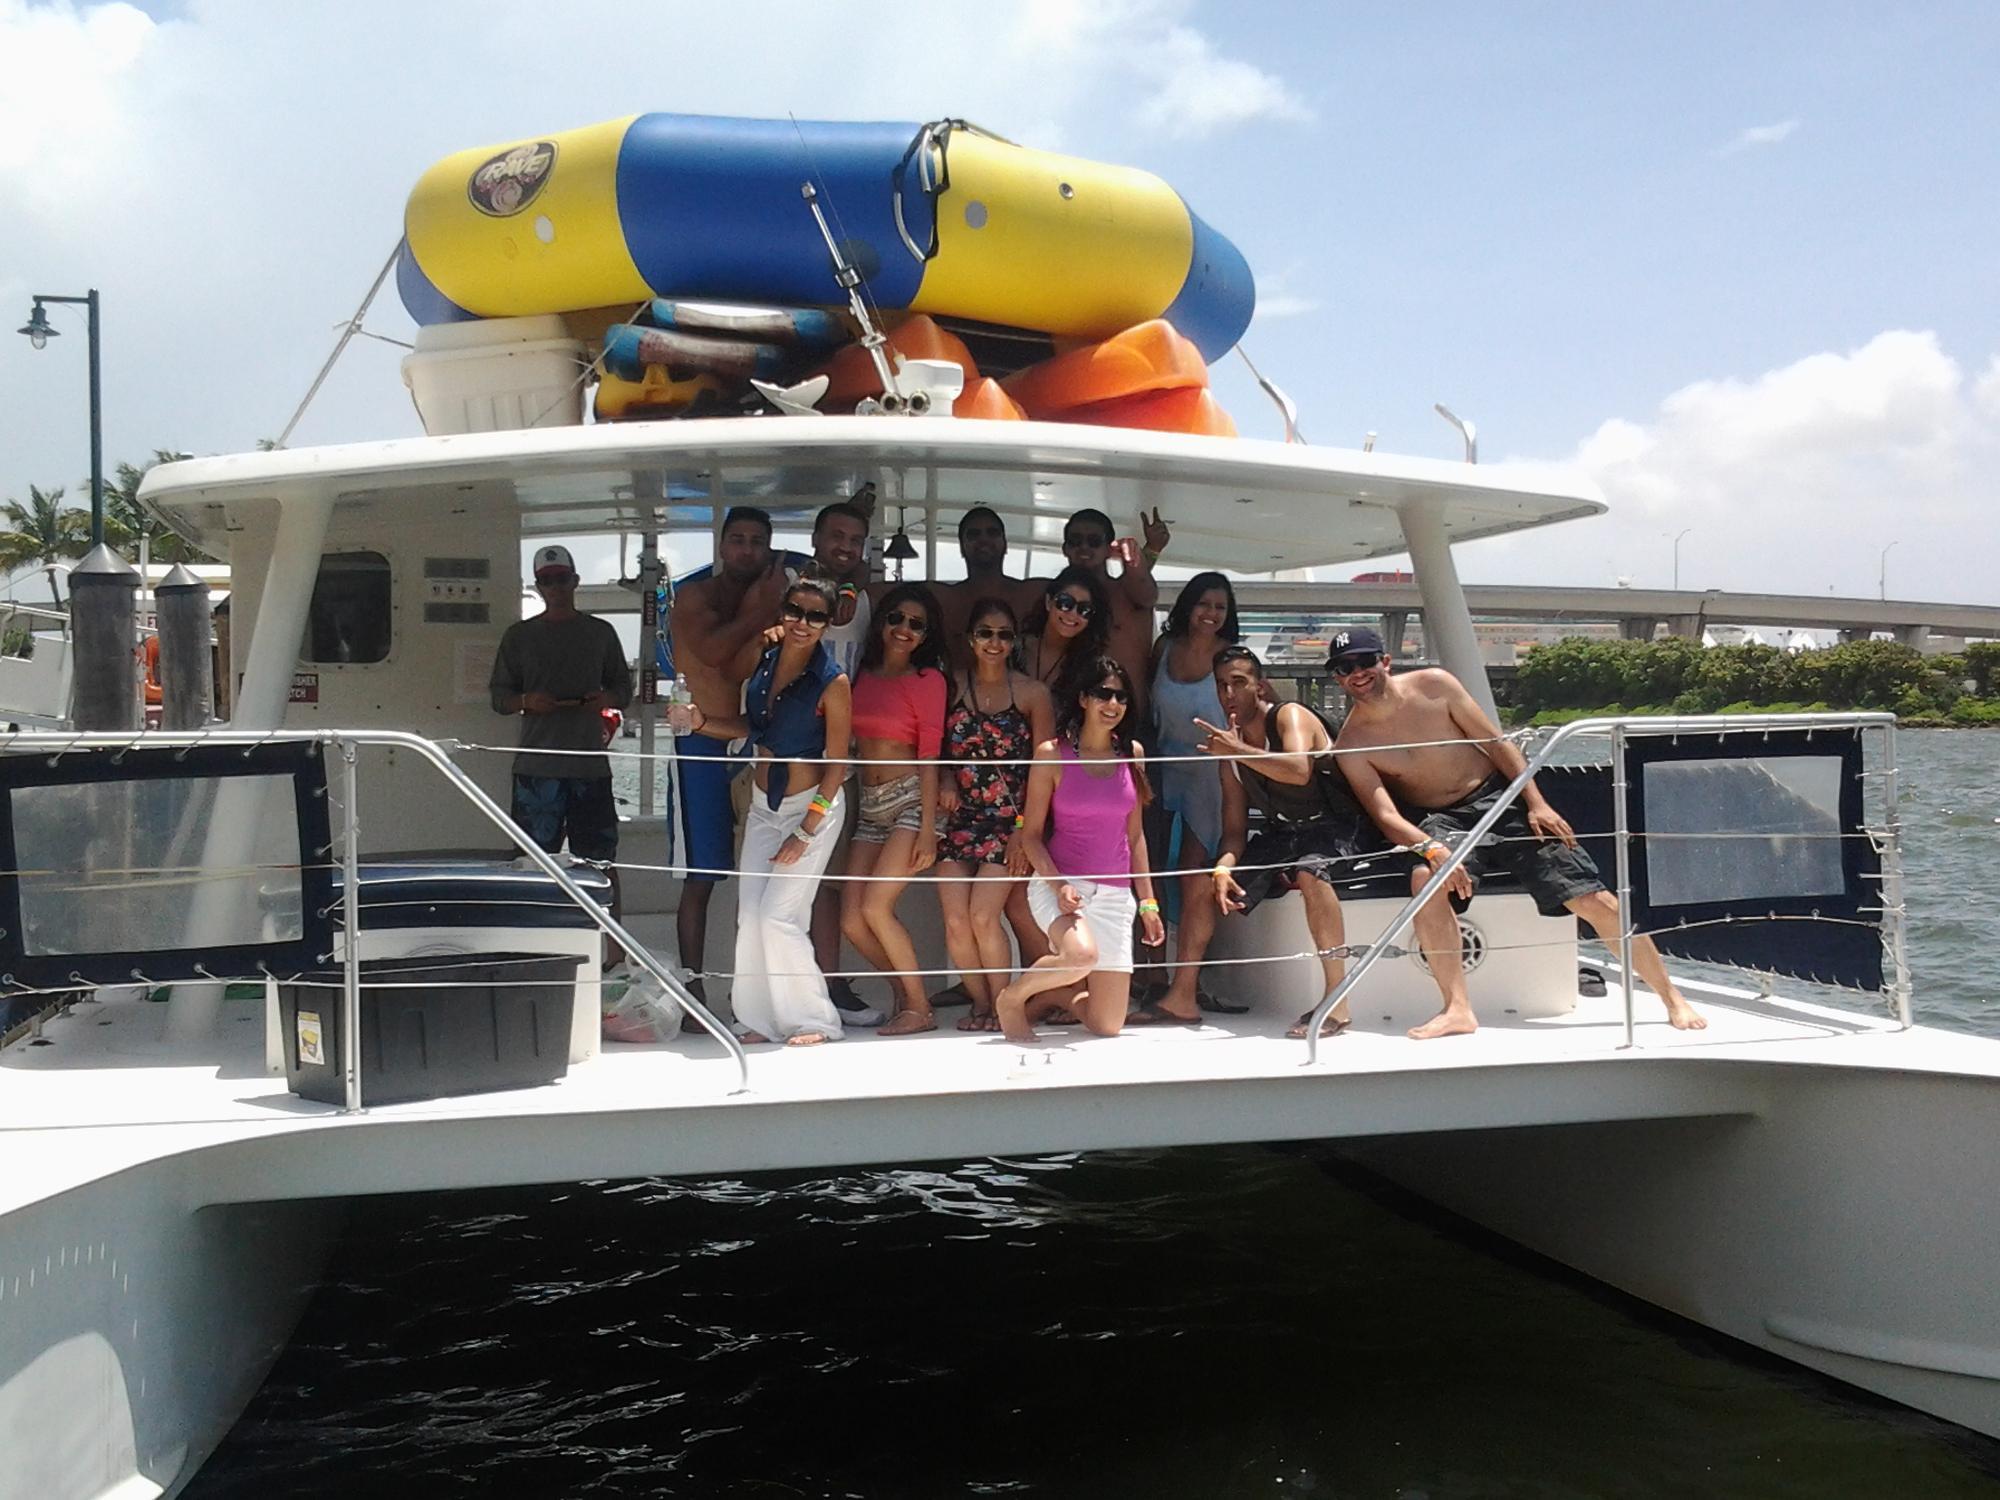 Hard Rock Cafe Boat Miami